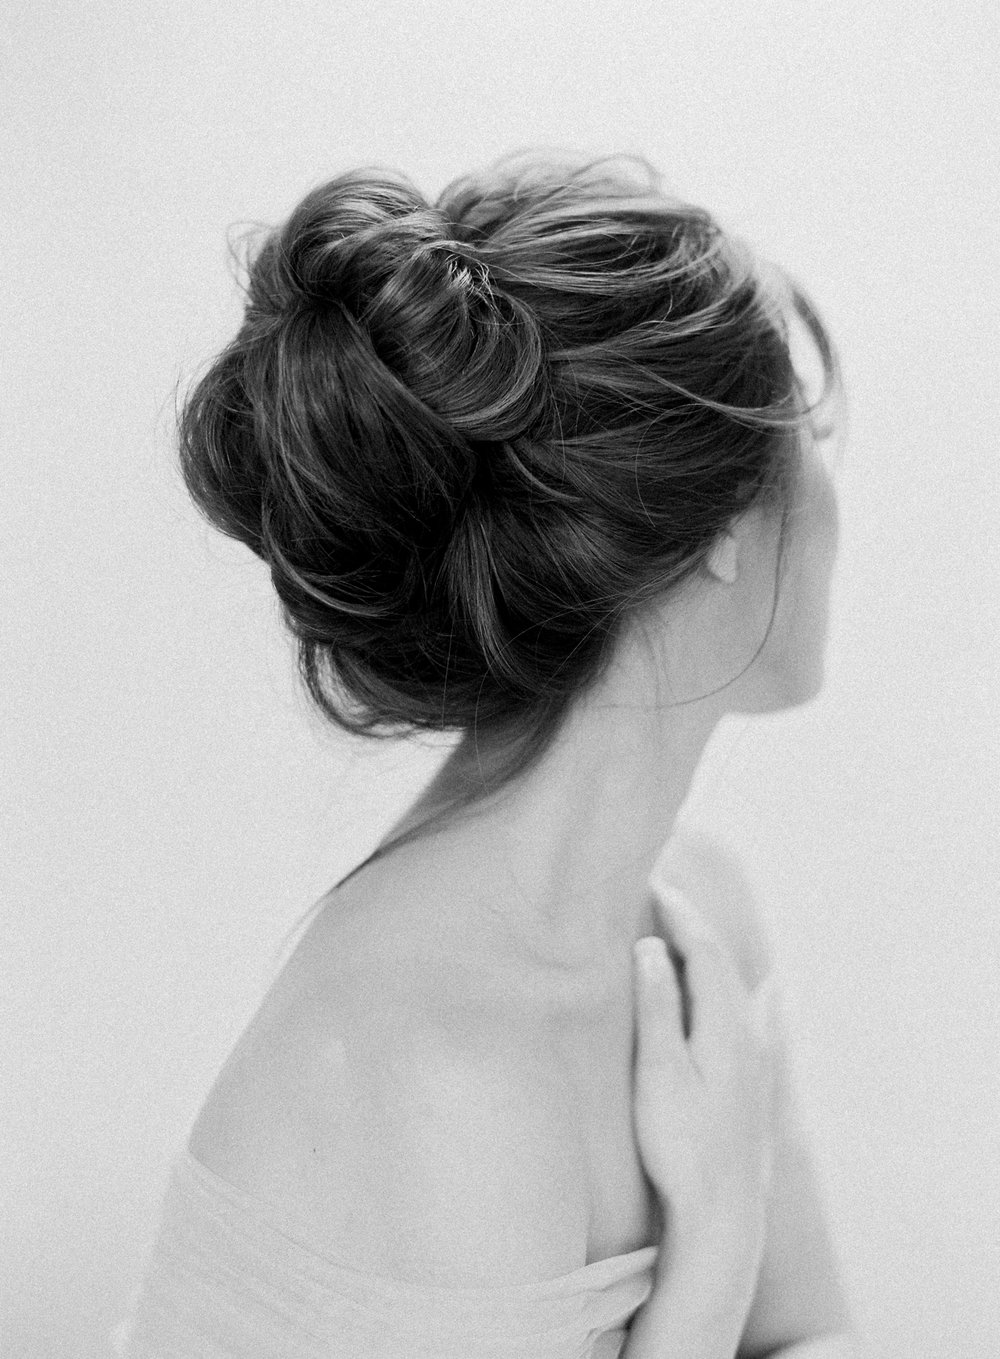 fine-art-portraits-4-Jen_Huang-006111-R2-006.jpg